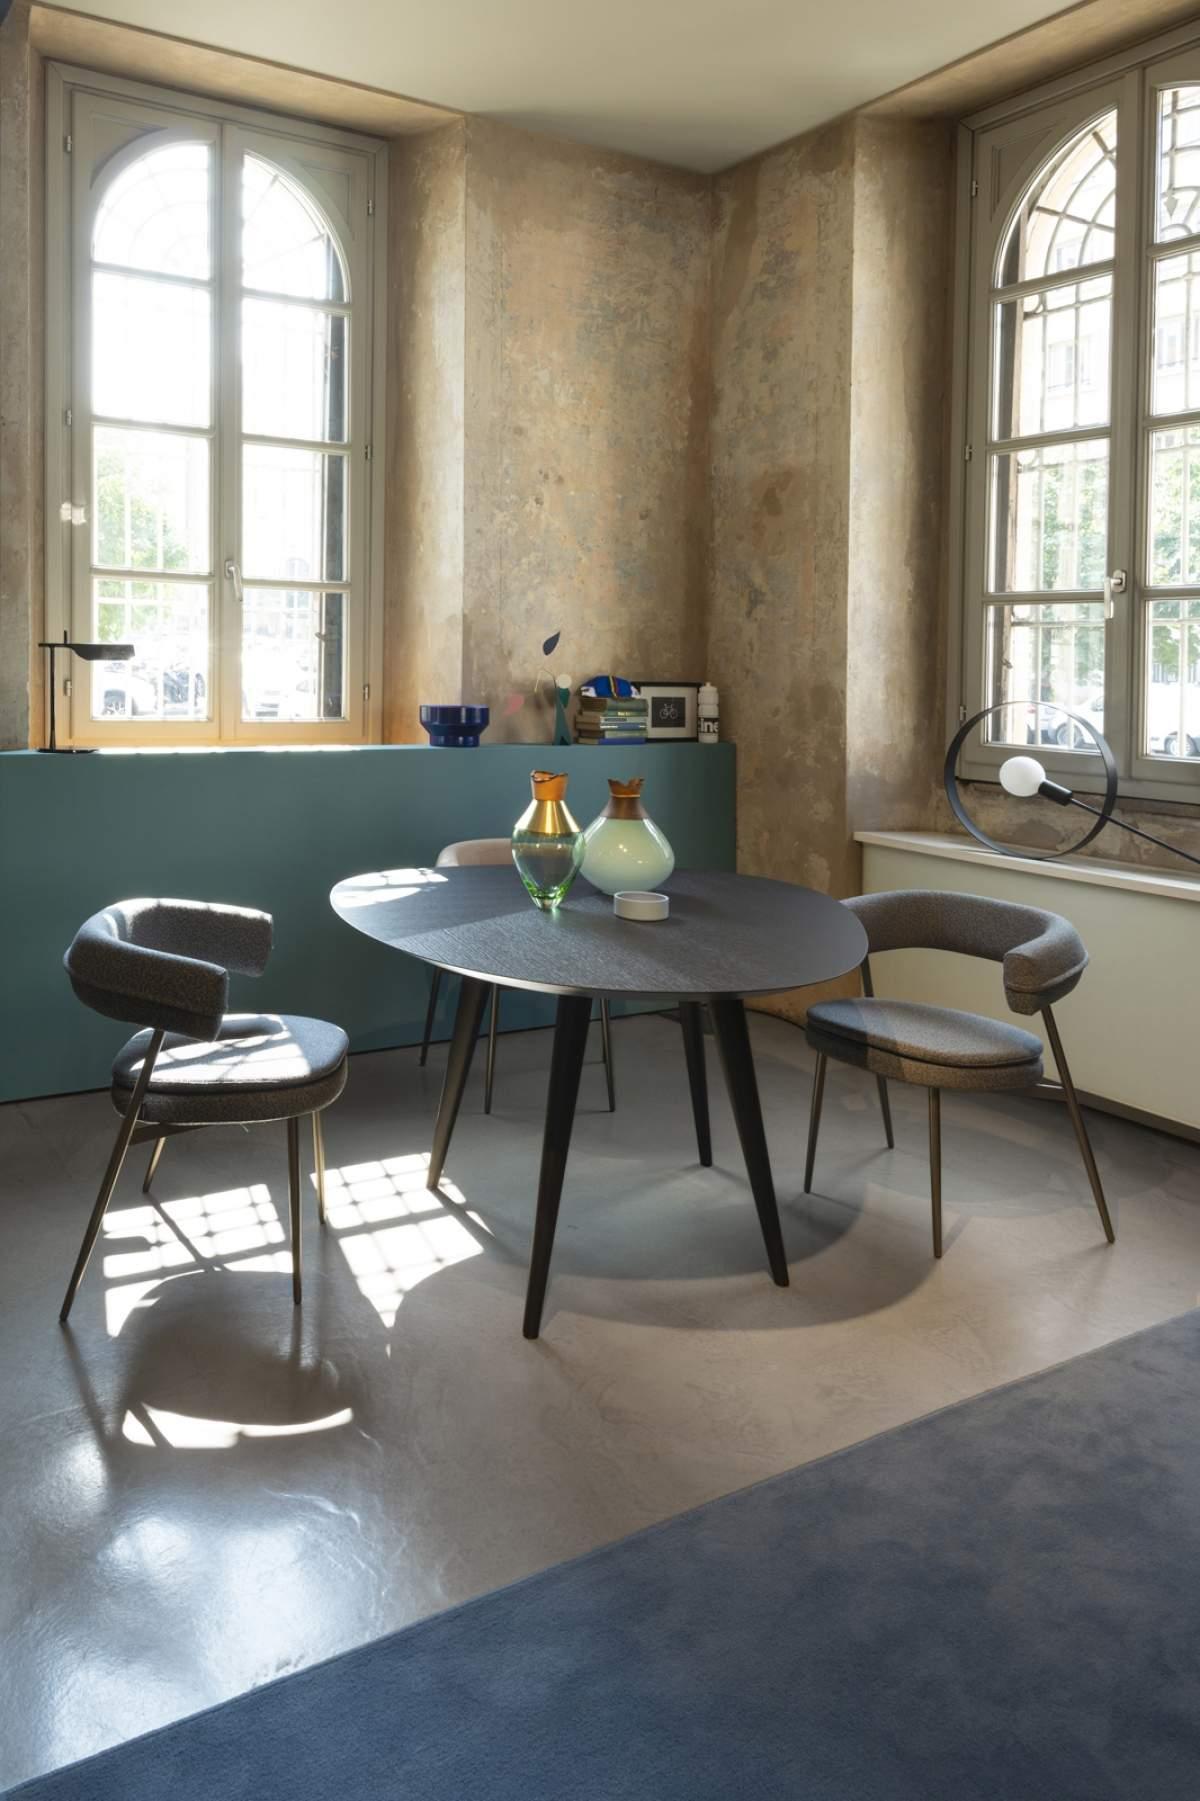 Lunch - Collection 2020 Back to emotions   Poltroncine Nena (Lanzavecchia & Wai, 2020)